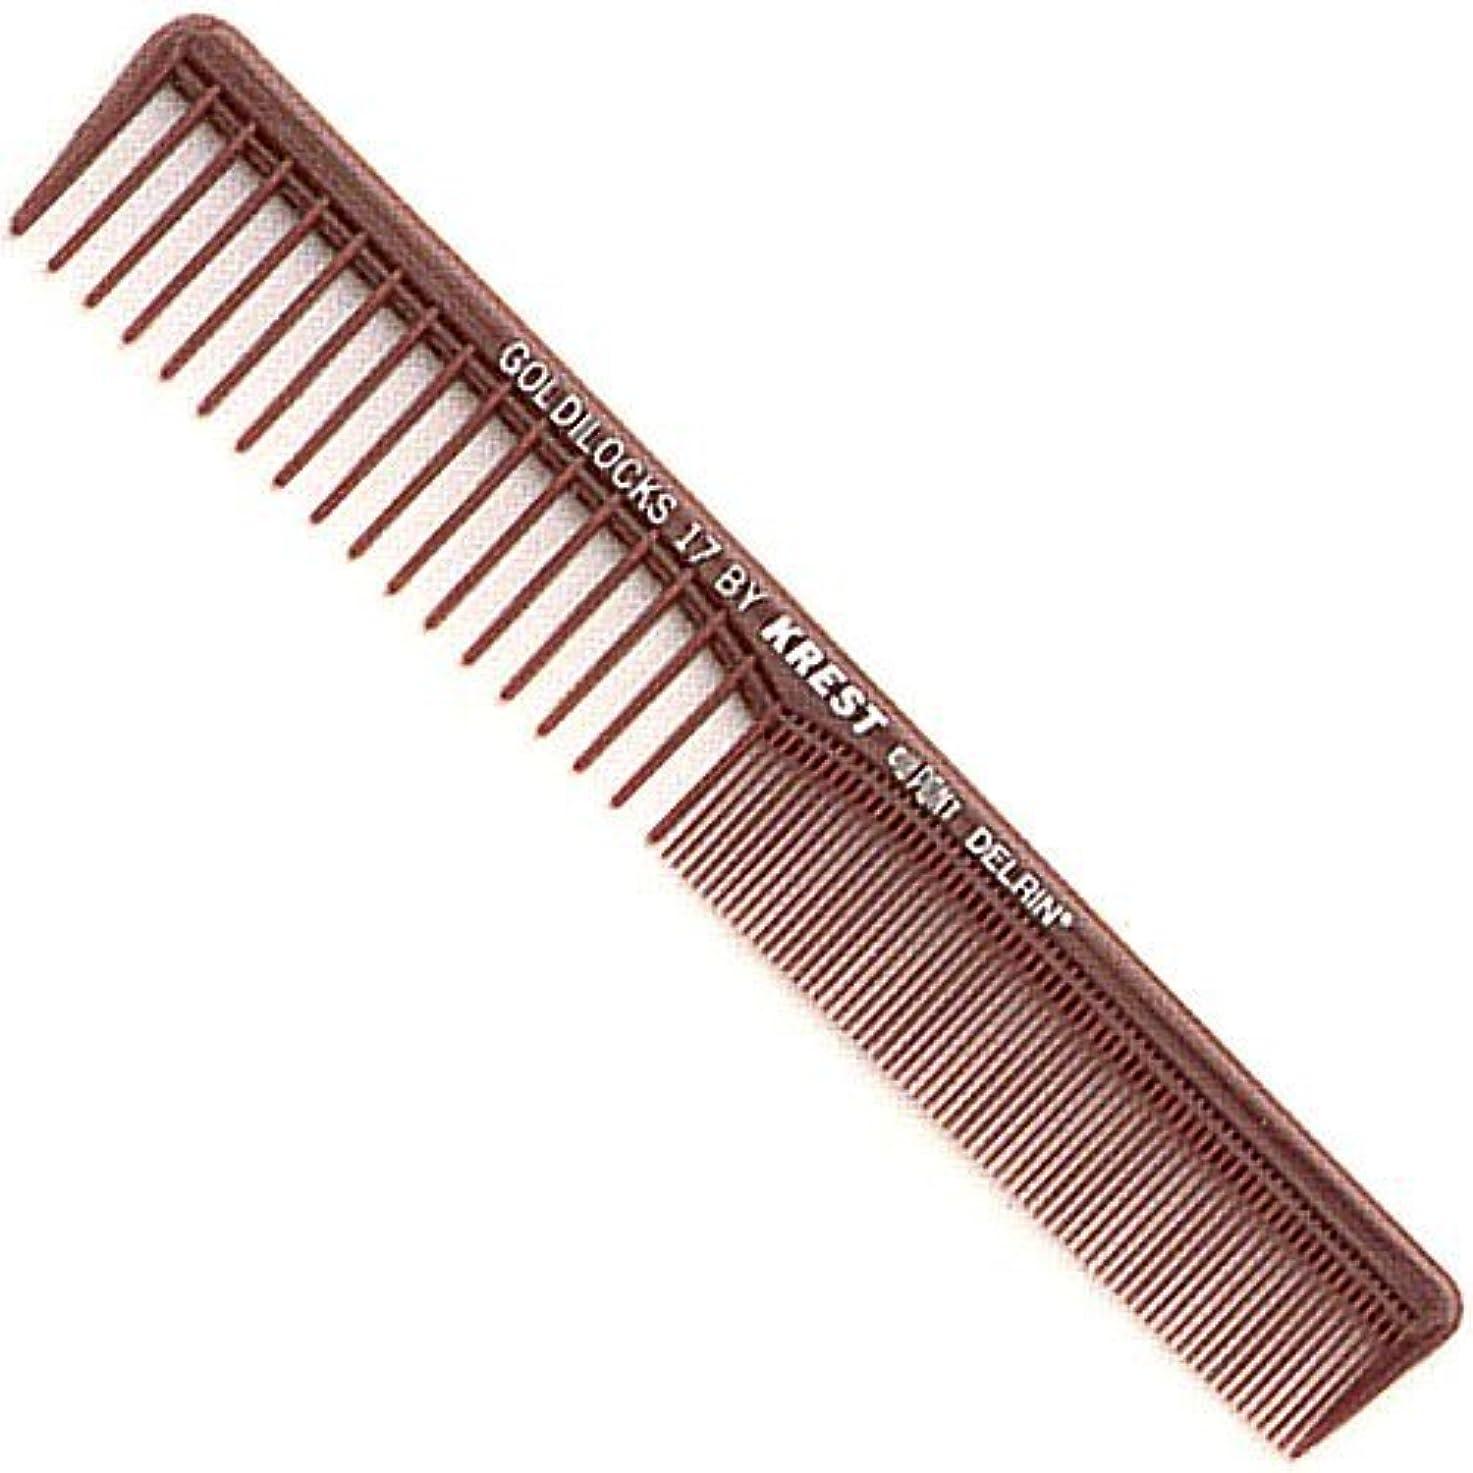 開梱陰気究極のKrest Combs Goldilocks Space Tooth Fine Tooth Styler Comb 7